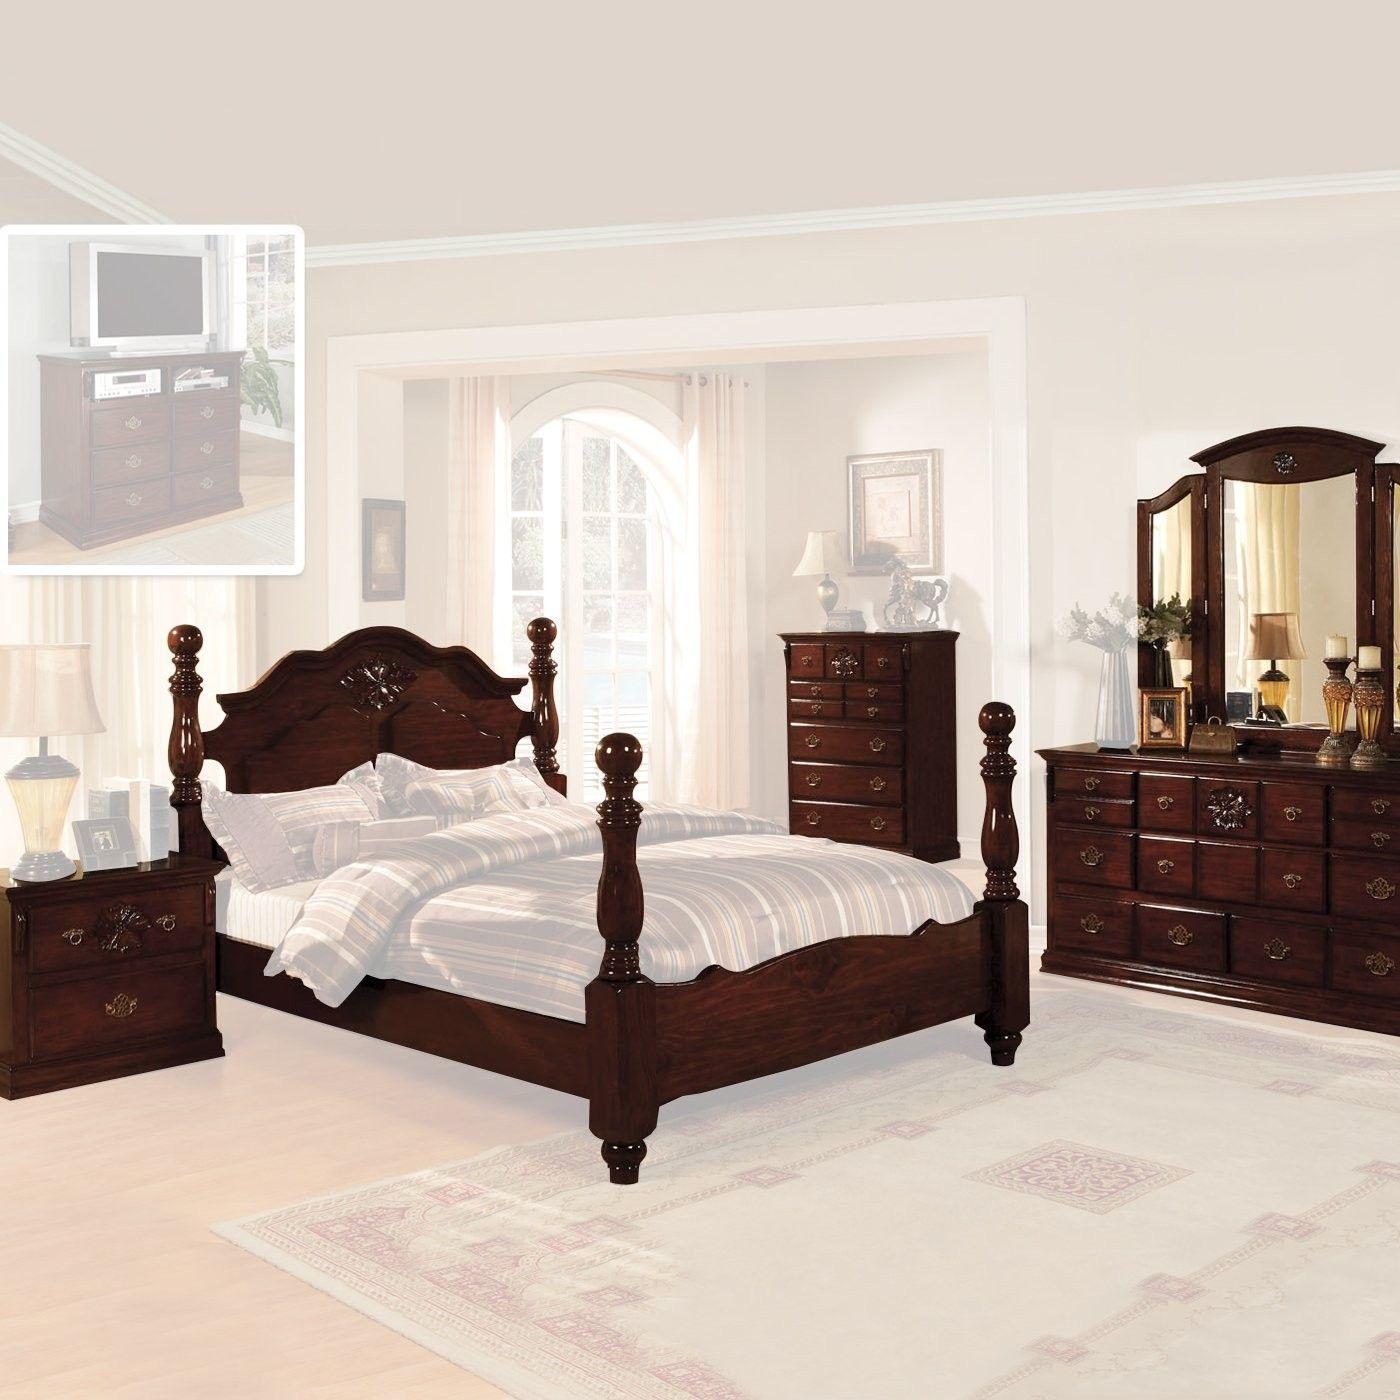 Furniture of America Tuscan Five Piece Bedroom Set, Dark